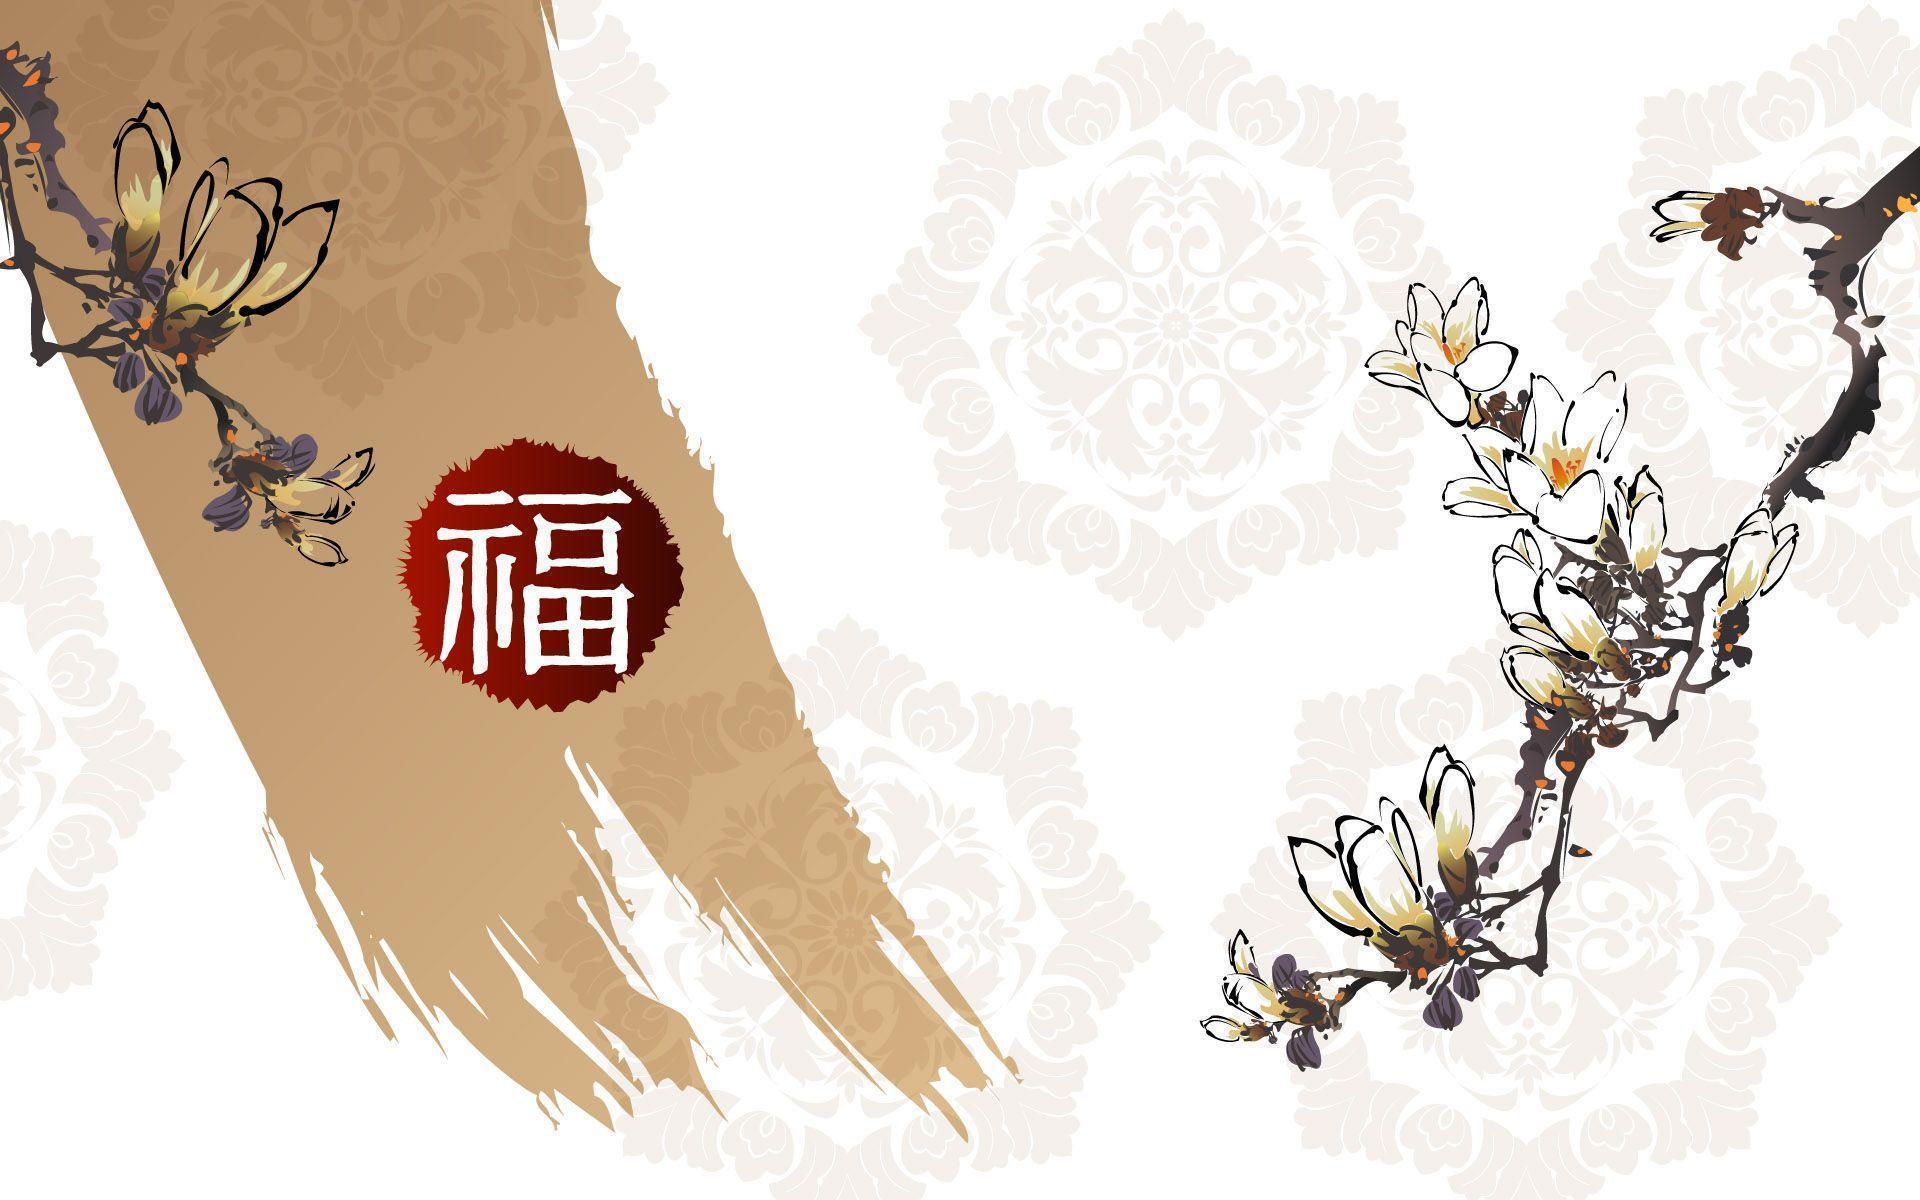 Chinese New Year Wallpaper Desktop Photos #4098 Wallpaper ...